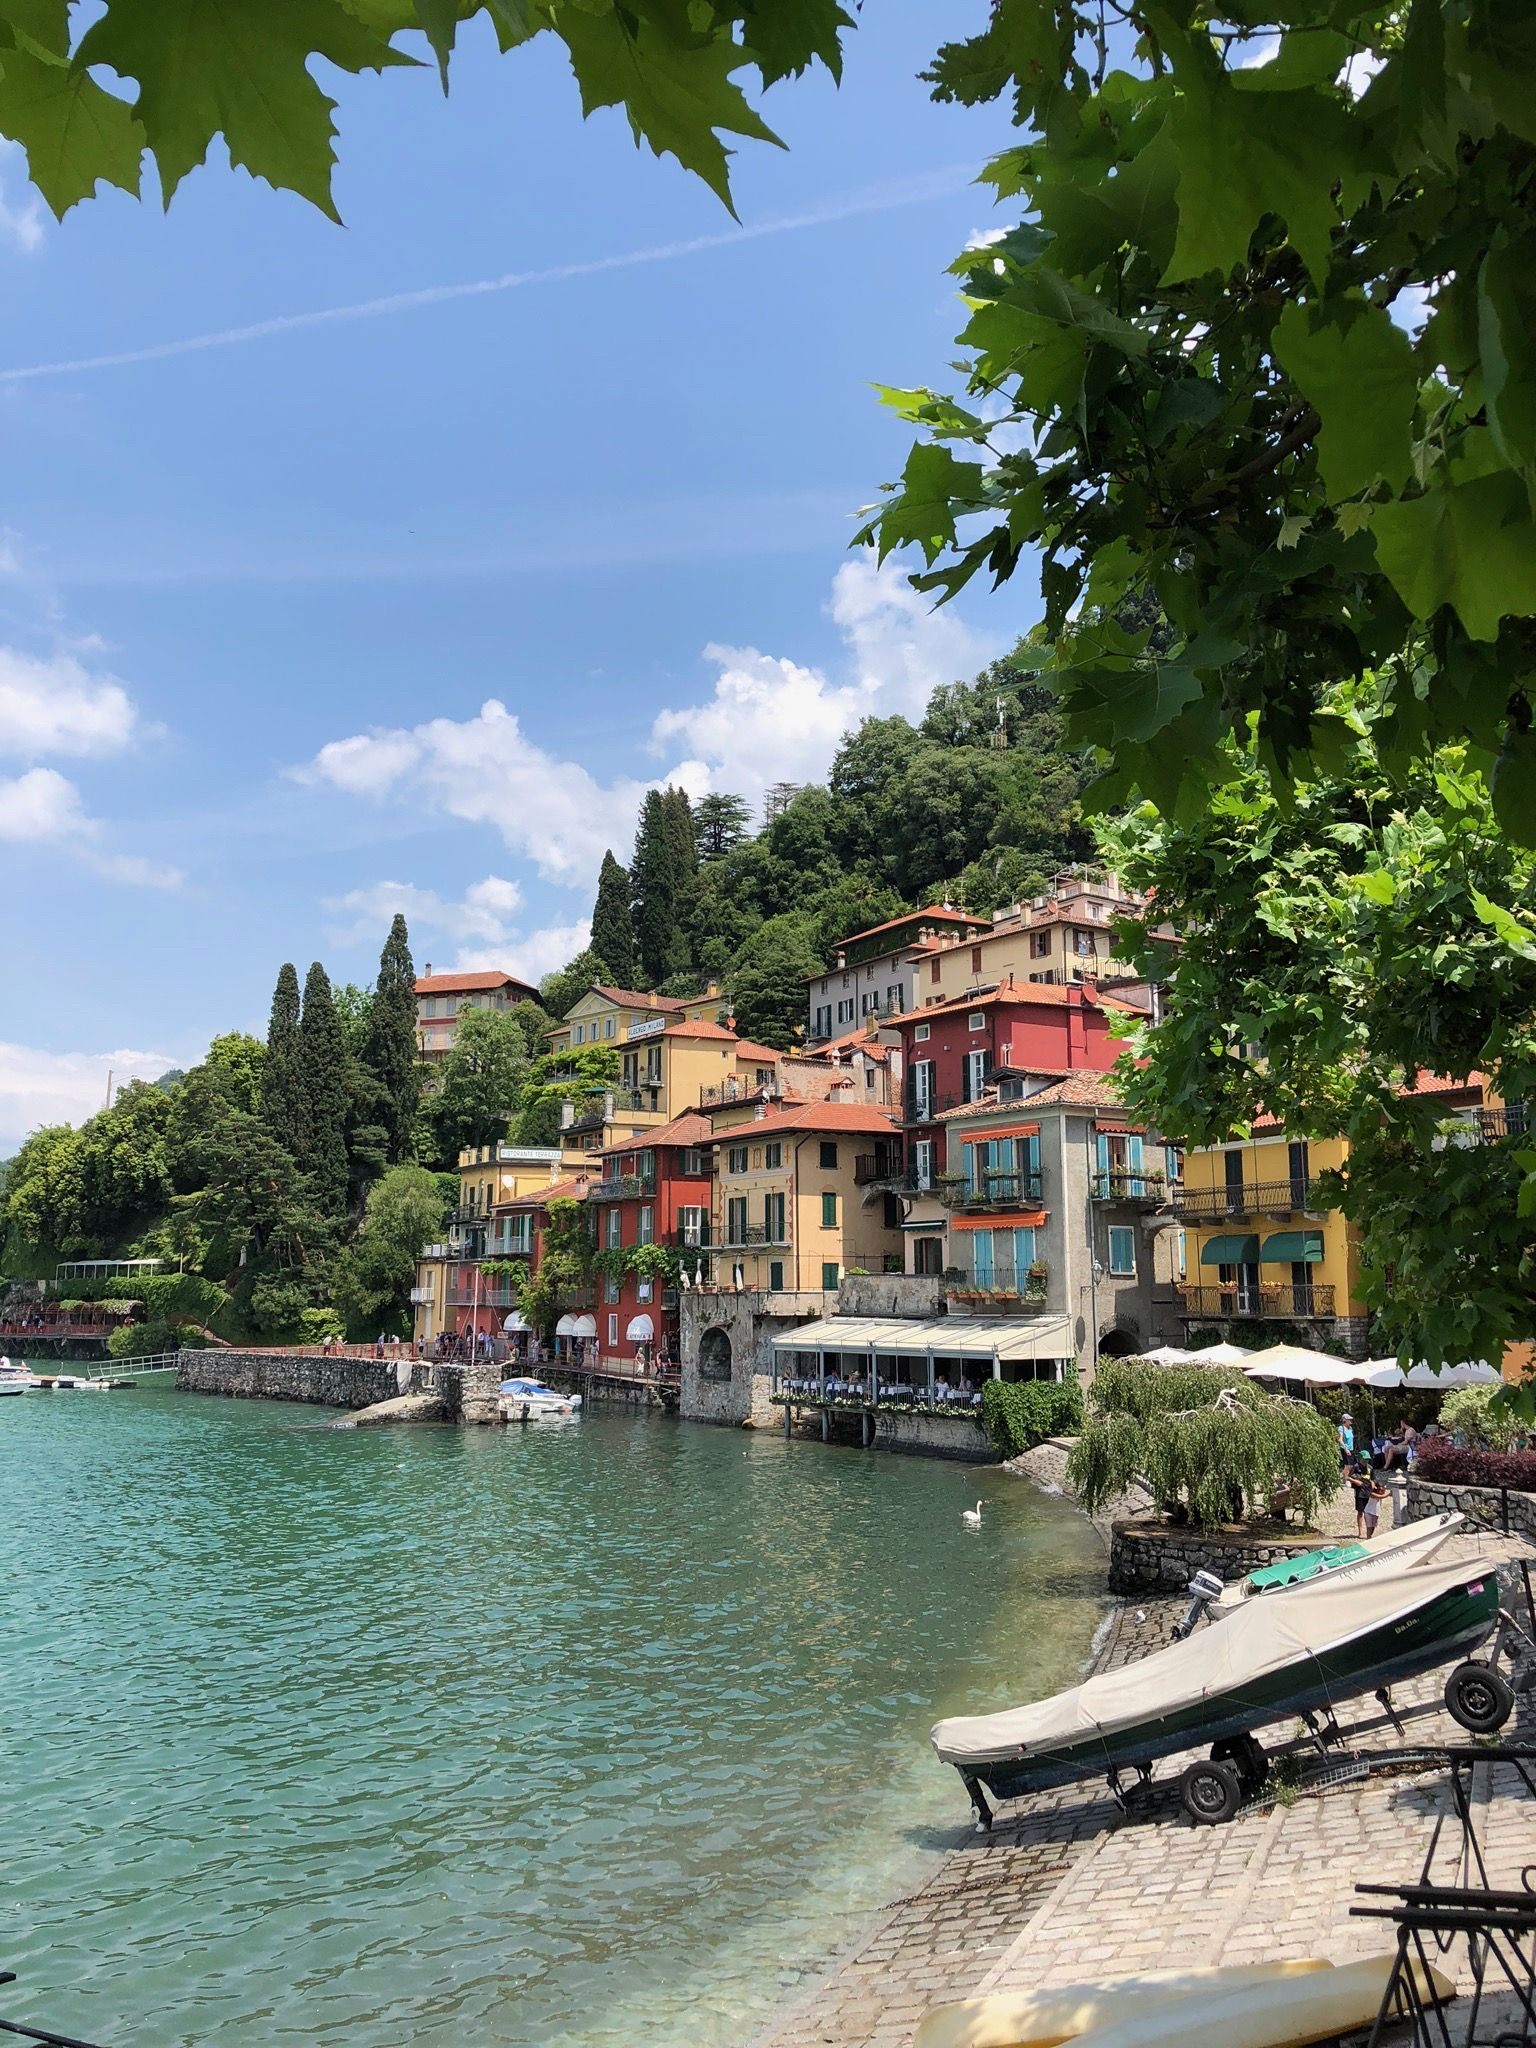 Varenna Beautiful Places To Travel World Beautiful City Venice Italy Travel